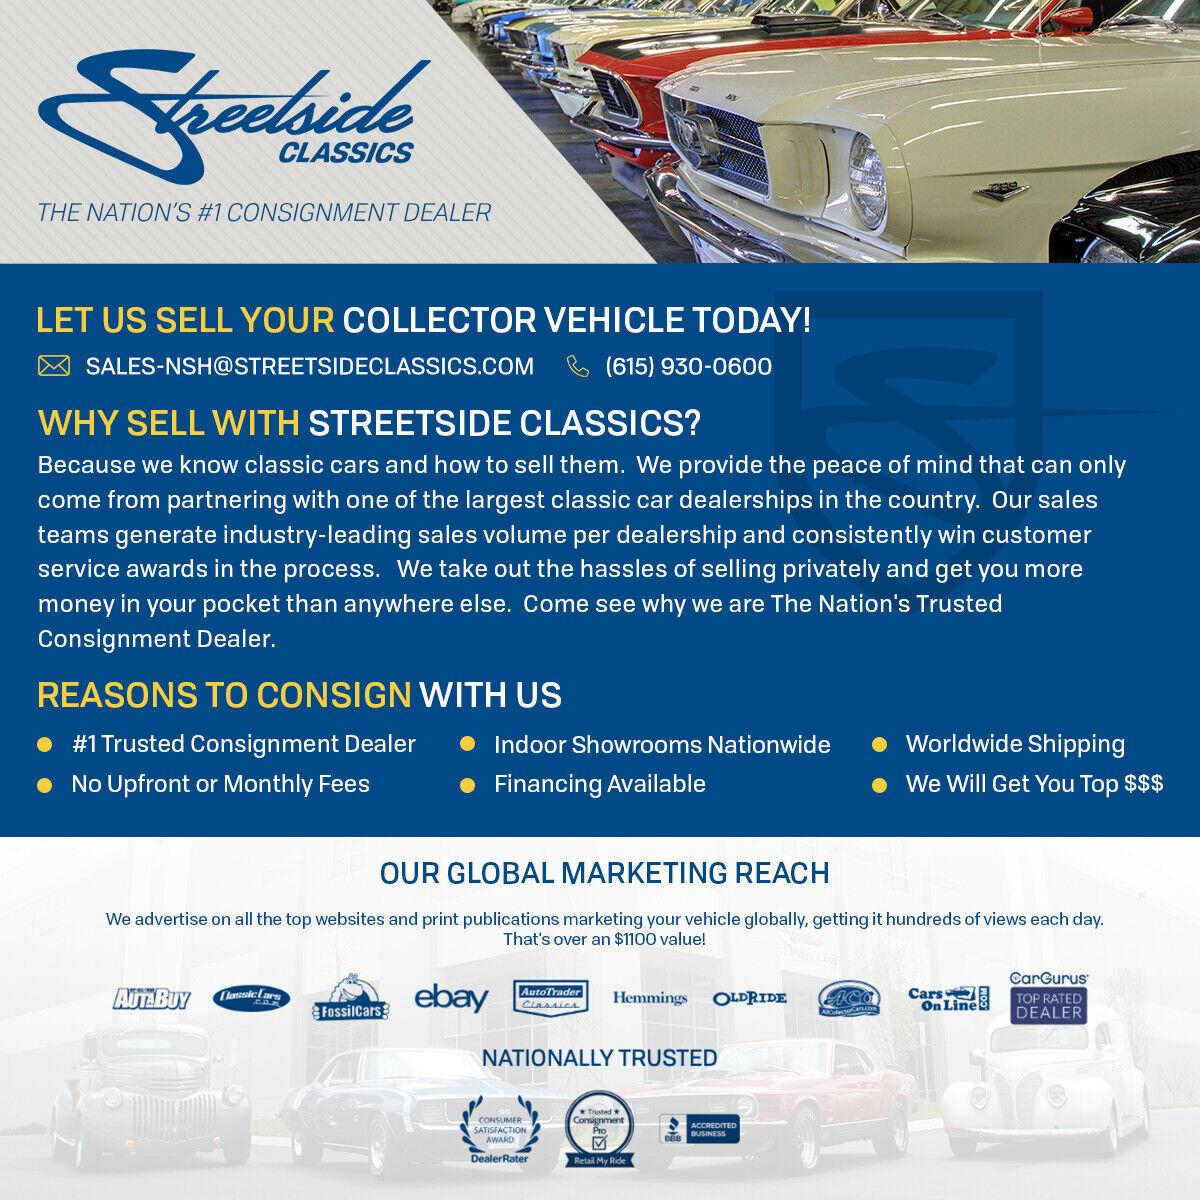 1973 Blue Chevrolet Corvette Convertible    C3 Corvette Photo 2